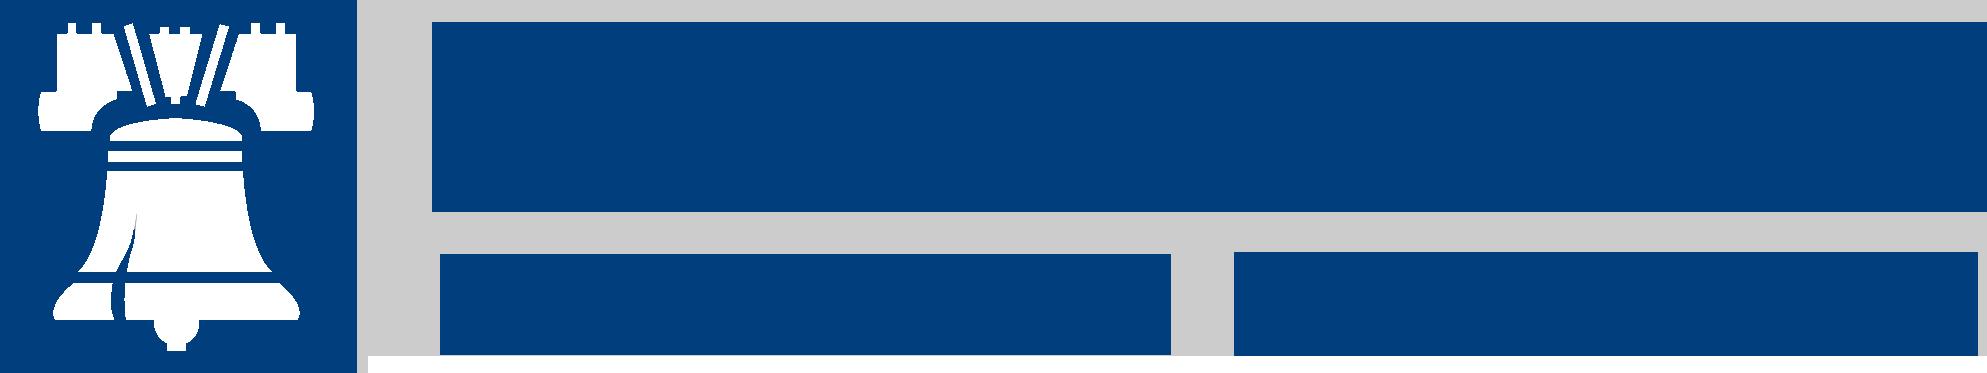 Postphiladelphia Insurance Companies Seminar Action Plan. Empire State College Nursing Suv Vs Sedan. Film Colleges In New York Movers In Dallas Tx. Masters Of Nursing Online Small Erp Solutions. Mobil Credit Card Processing. Good Spanish To English Translation. Locksmith Coconut Grove North Dakota Dentists. Web Development Business Long Distance Movers. Boston School Of Public Health